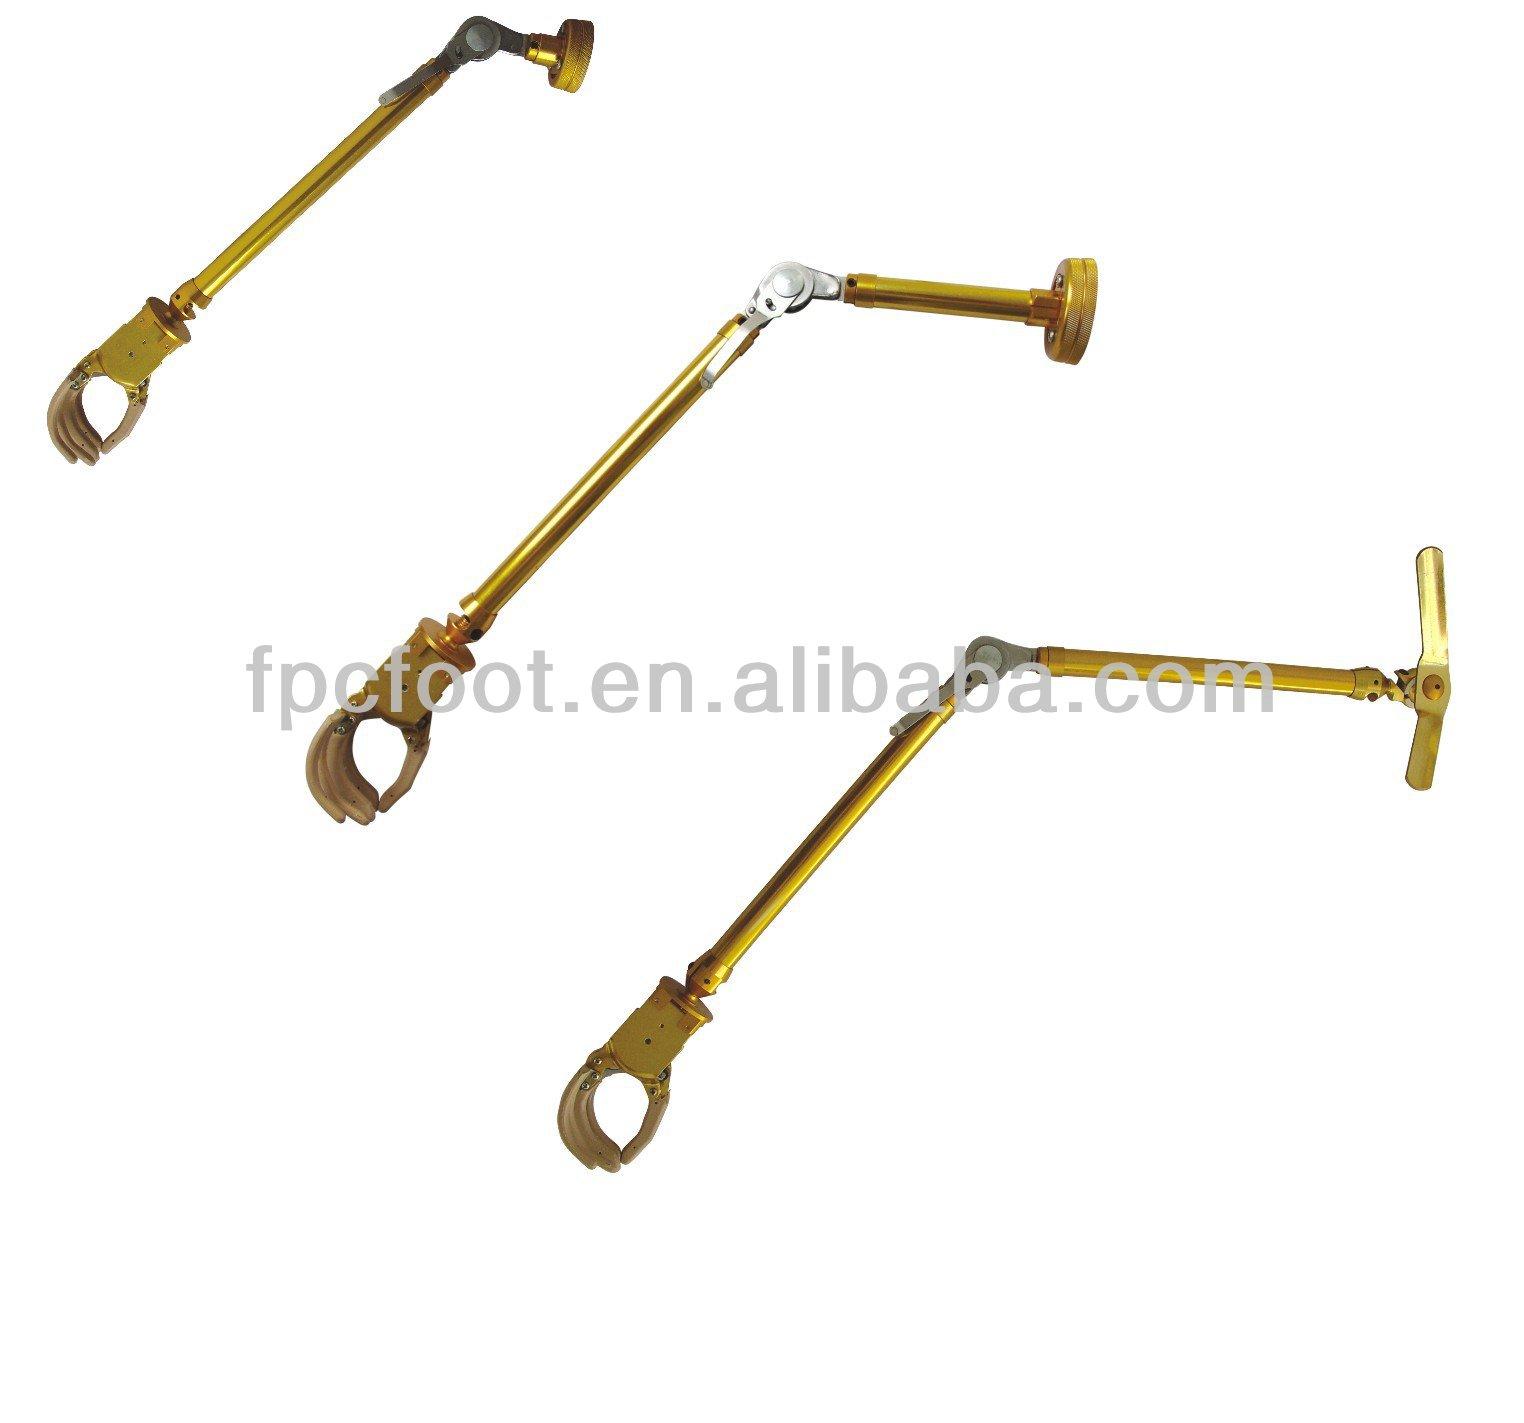 Prótesis de brazo componentes electrónicos - pasiva de manos libres